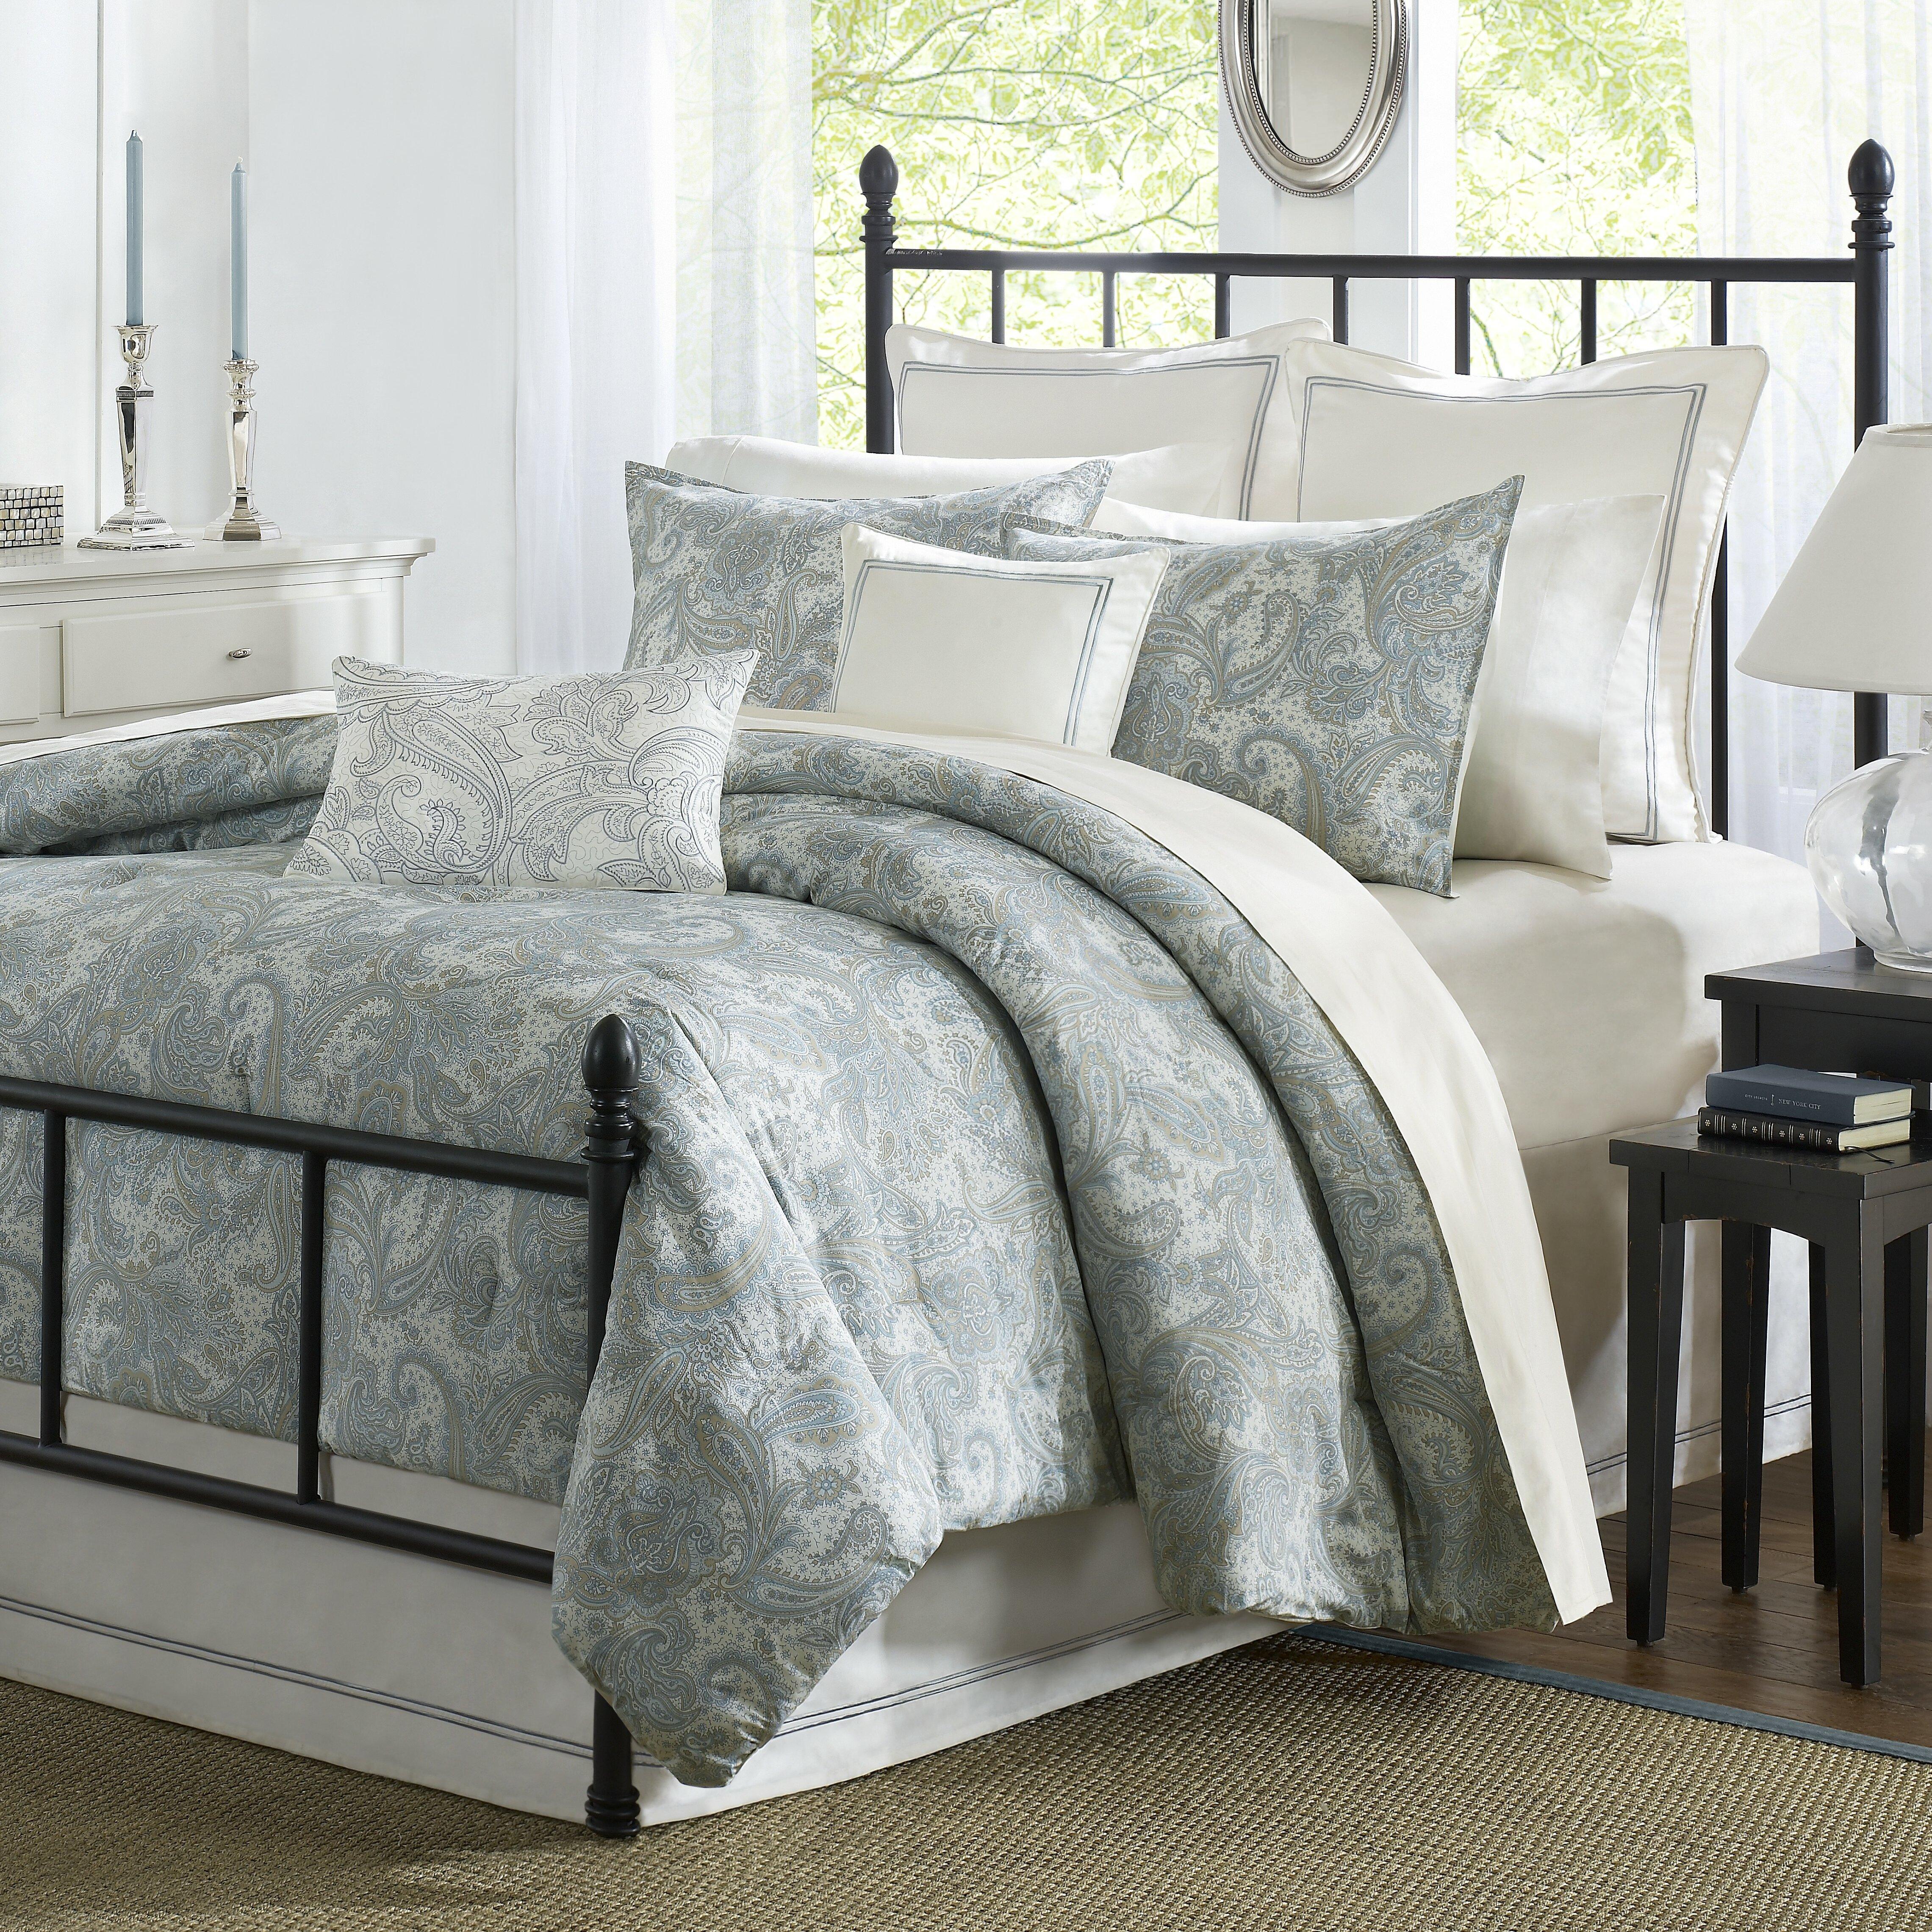 Harbor House Chelsea 4 Piece Reversible Comforter Set